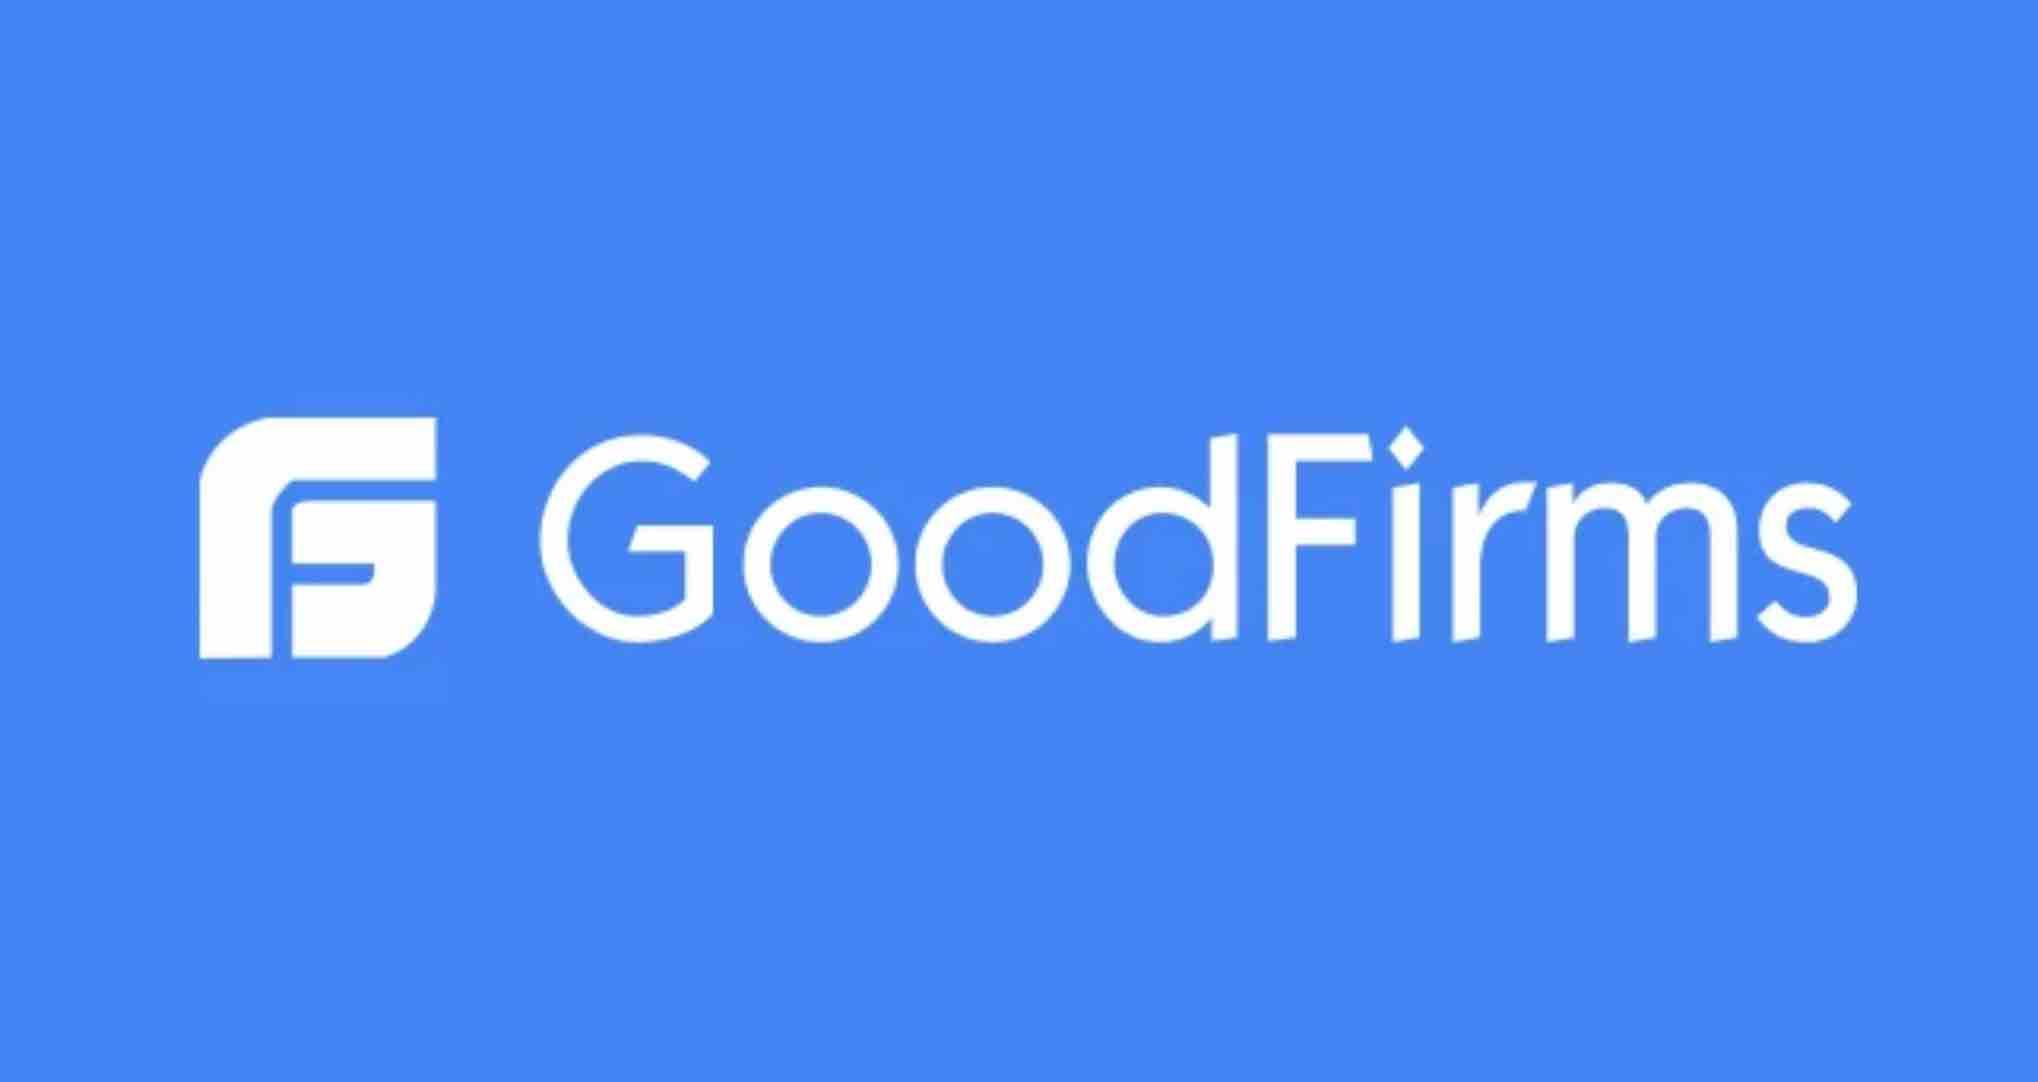 GoodFirms logo